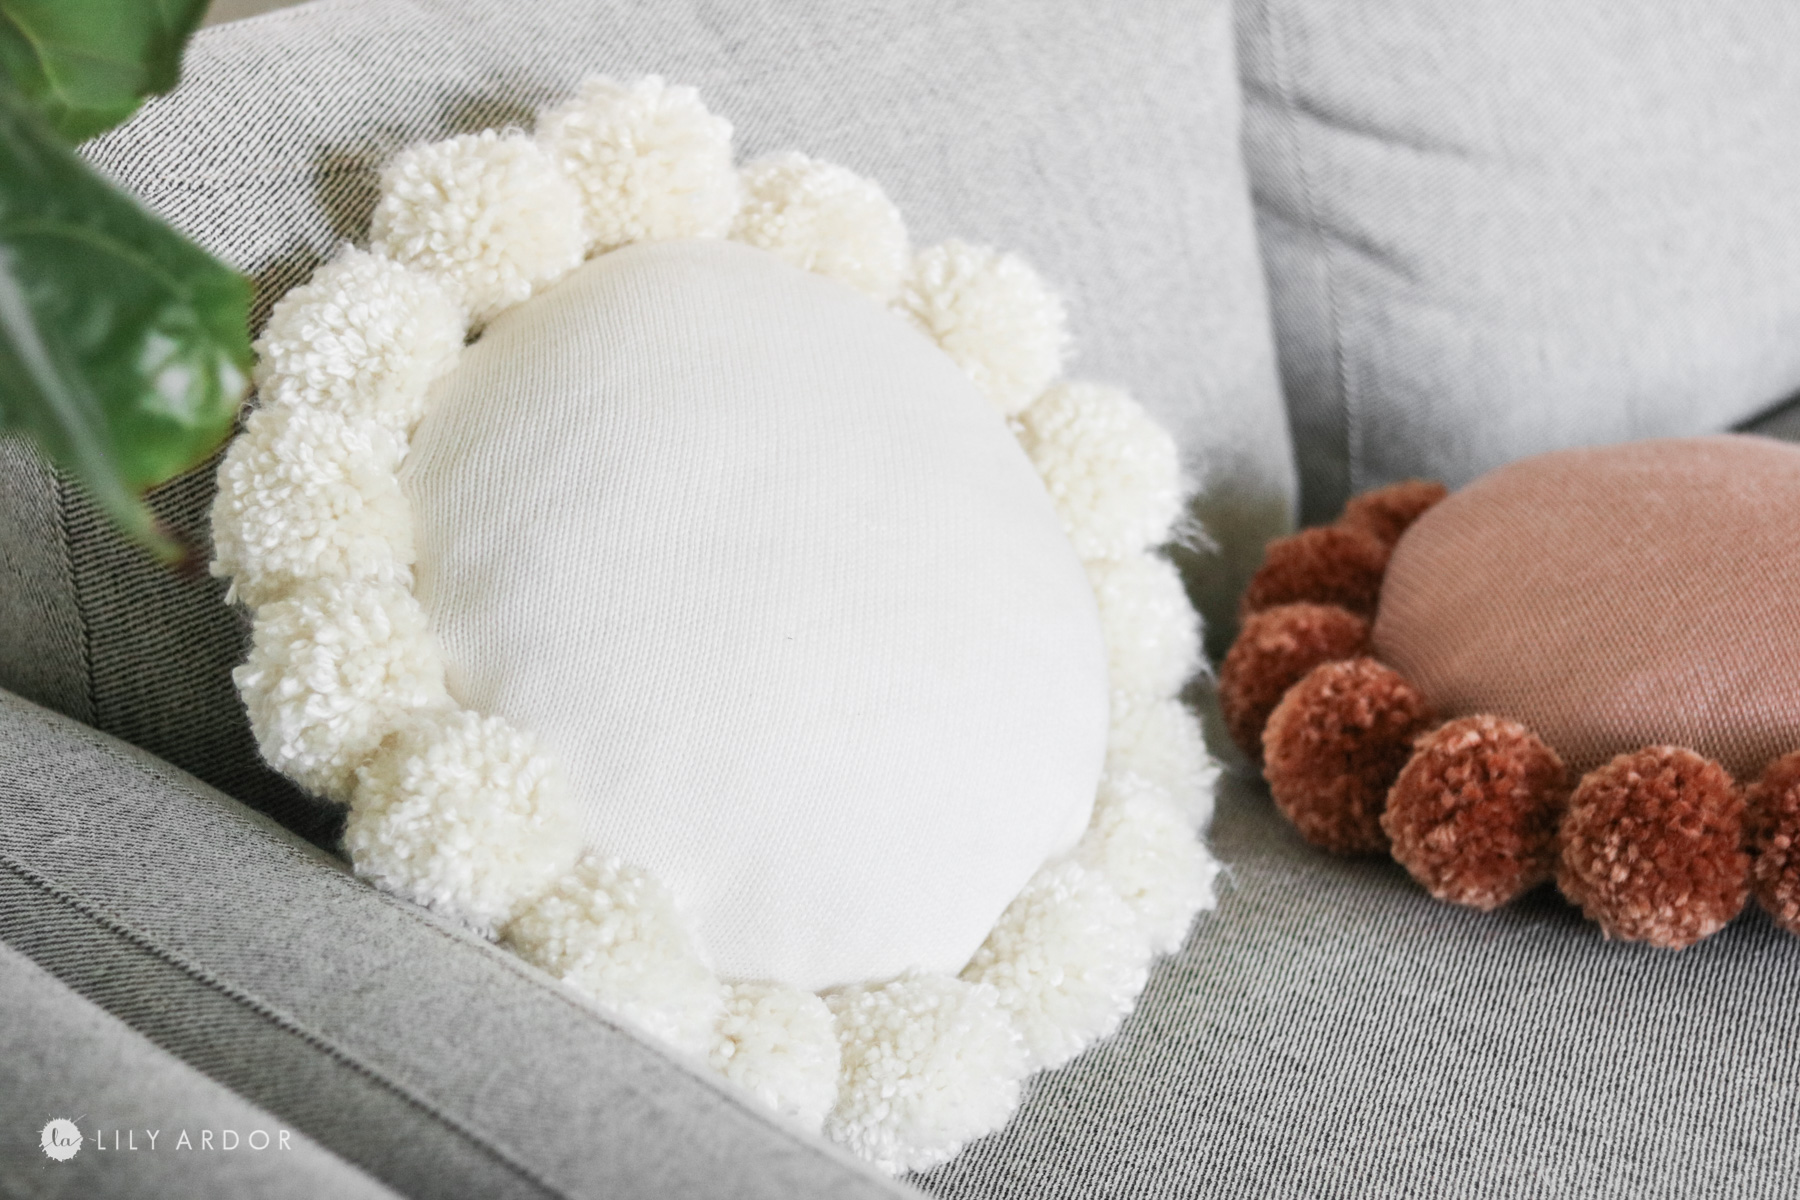 diy round throw pillow with pom poms